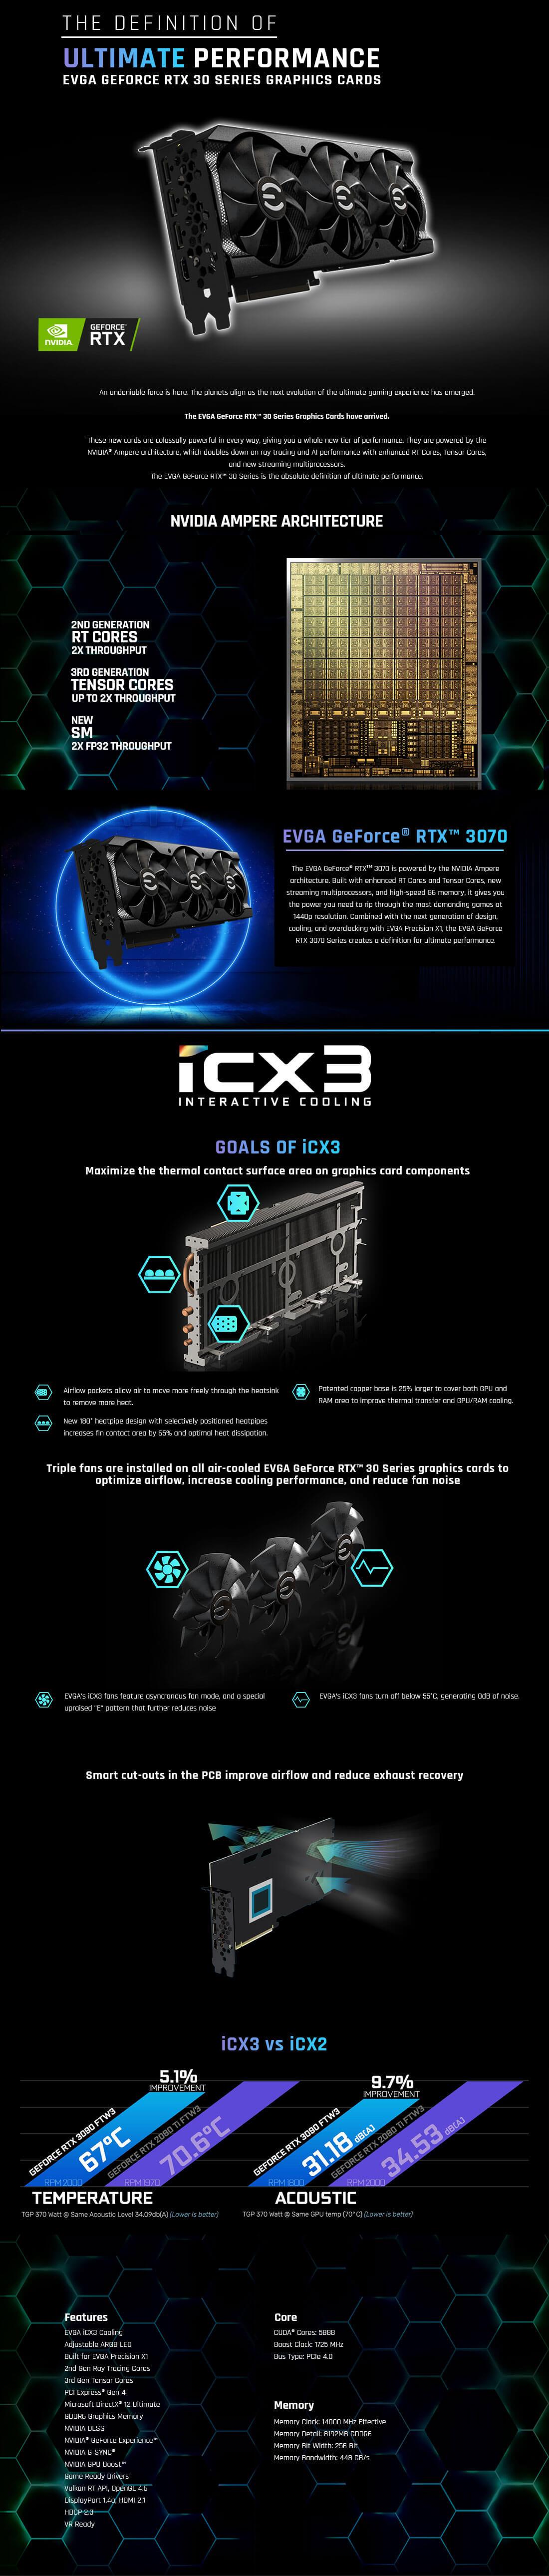 EVGA GeForce RTX™ 3070 XC3 BLACK GAMING - 8GB GDDR6 (Sao chép)